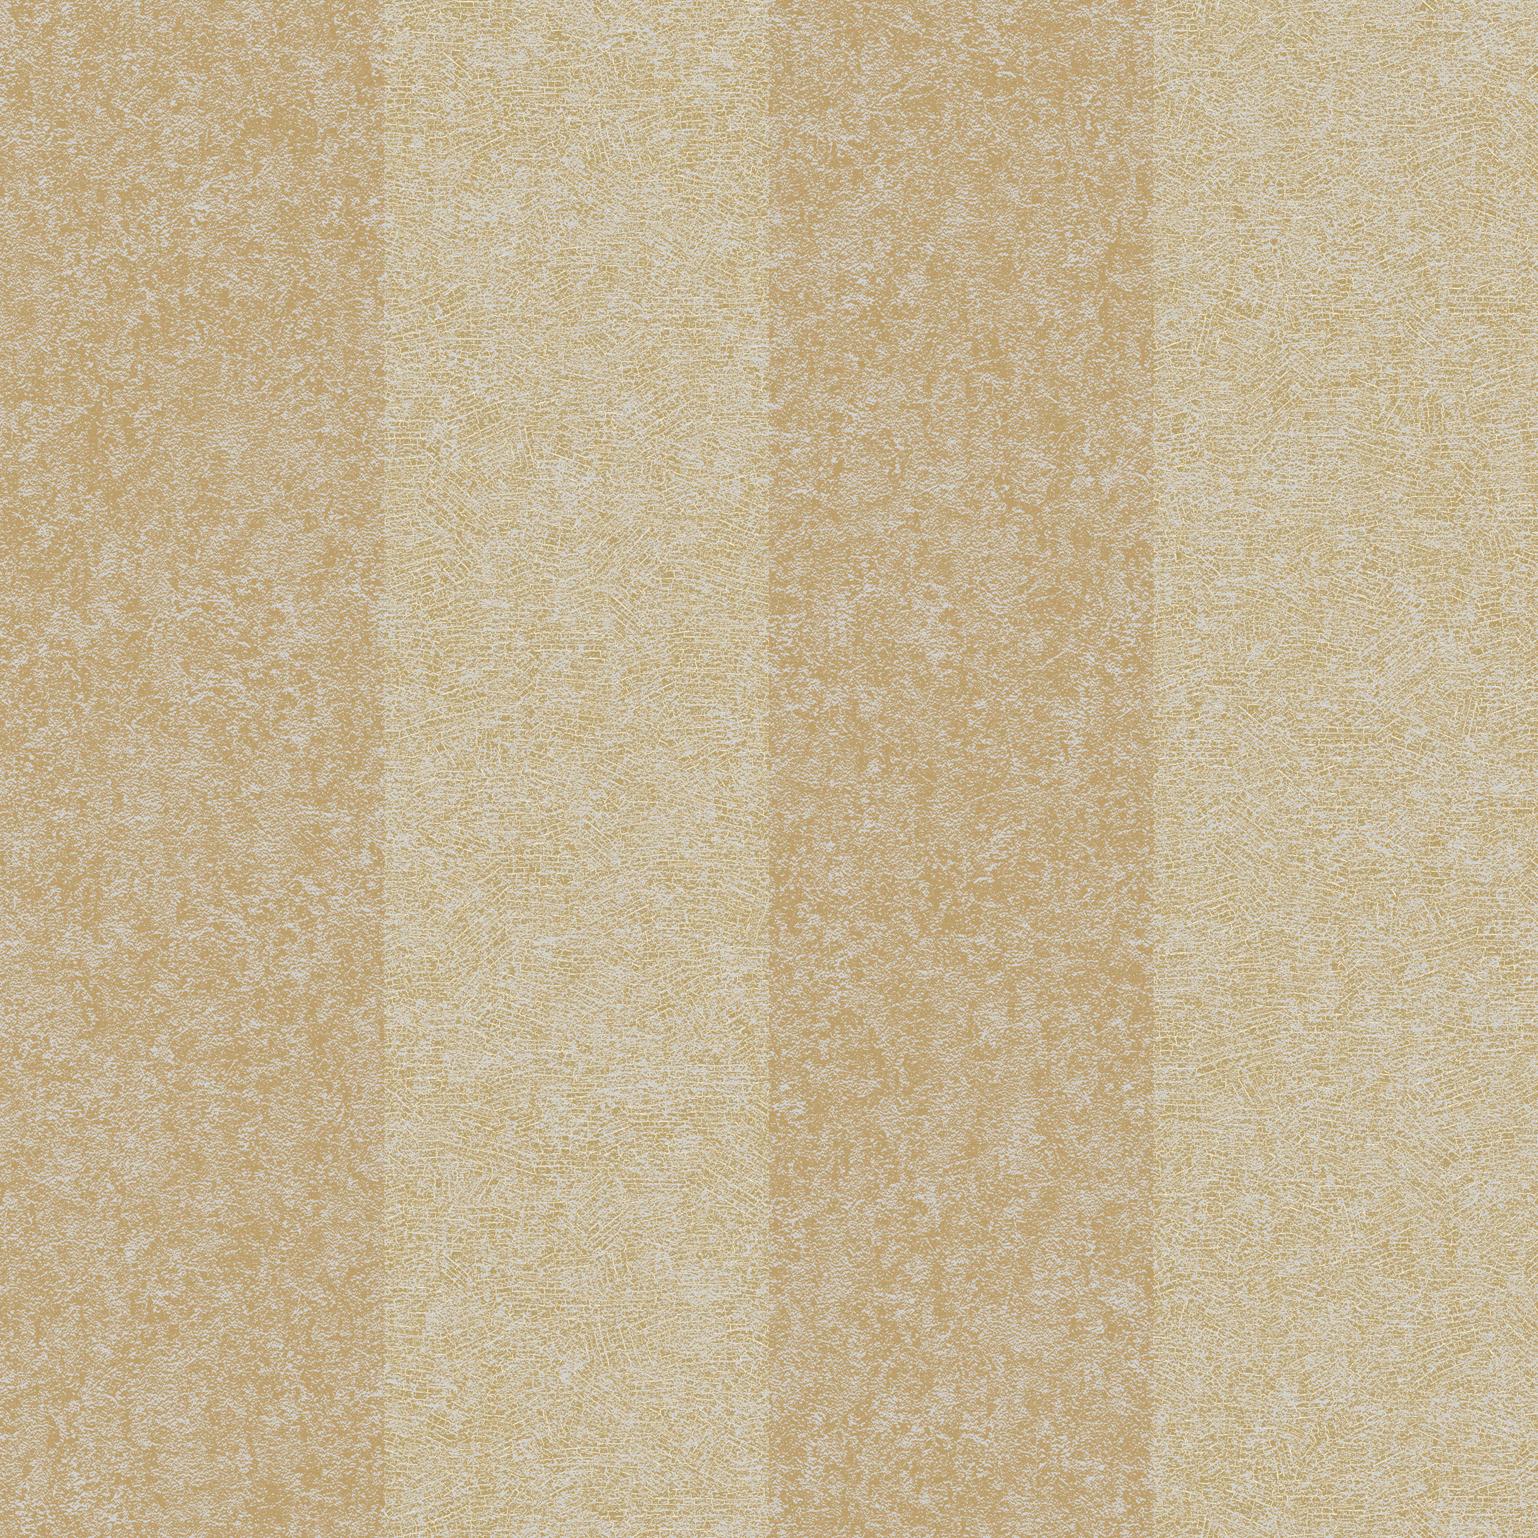 Picture of Belleek Stripe Light Brown Wallpaper